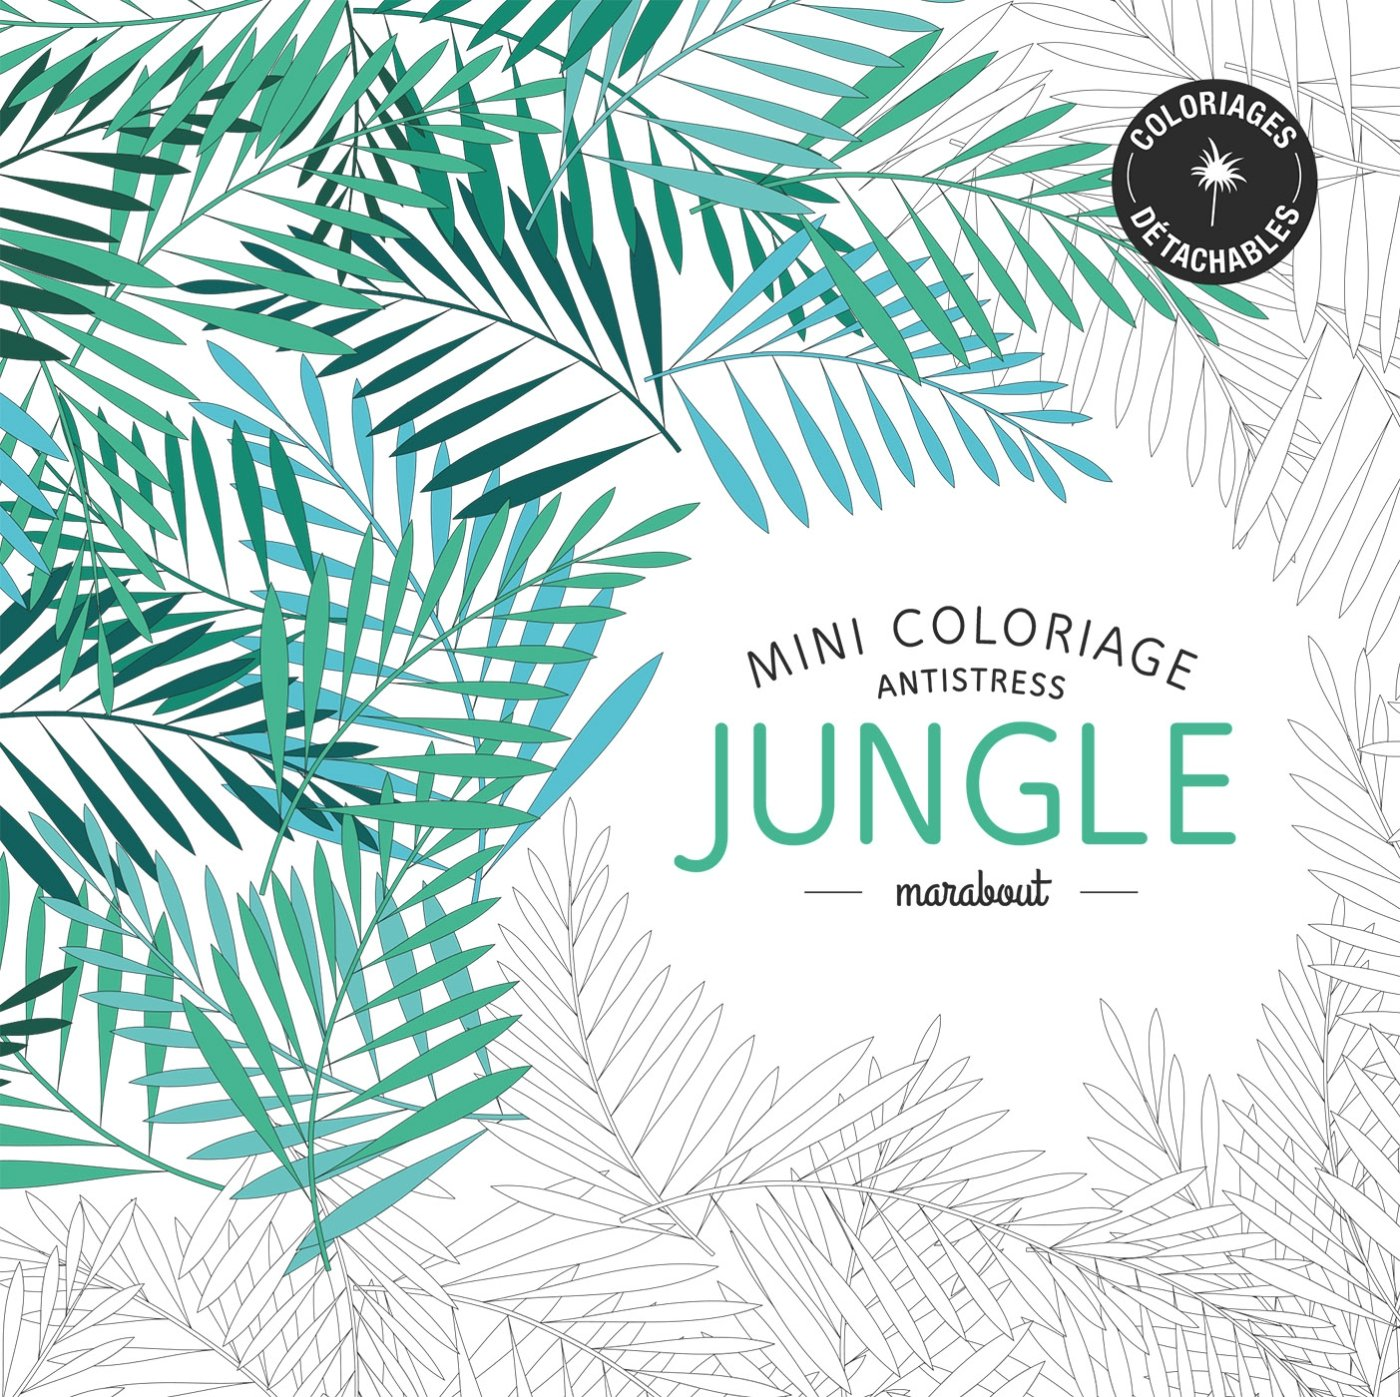 Mini coloriage anti stress Jungle French Edition Collectif Marabout Amazon Books